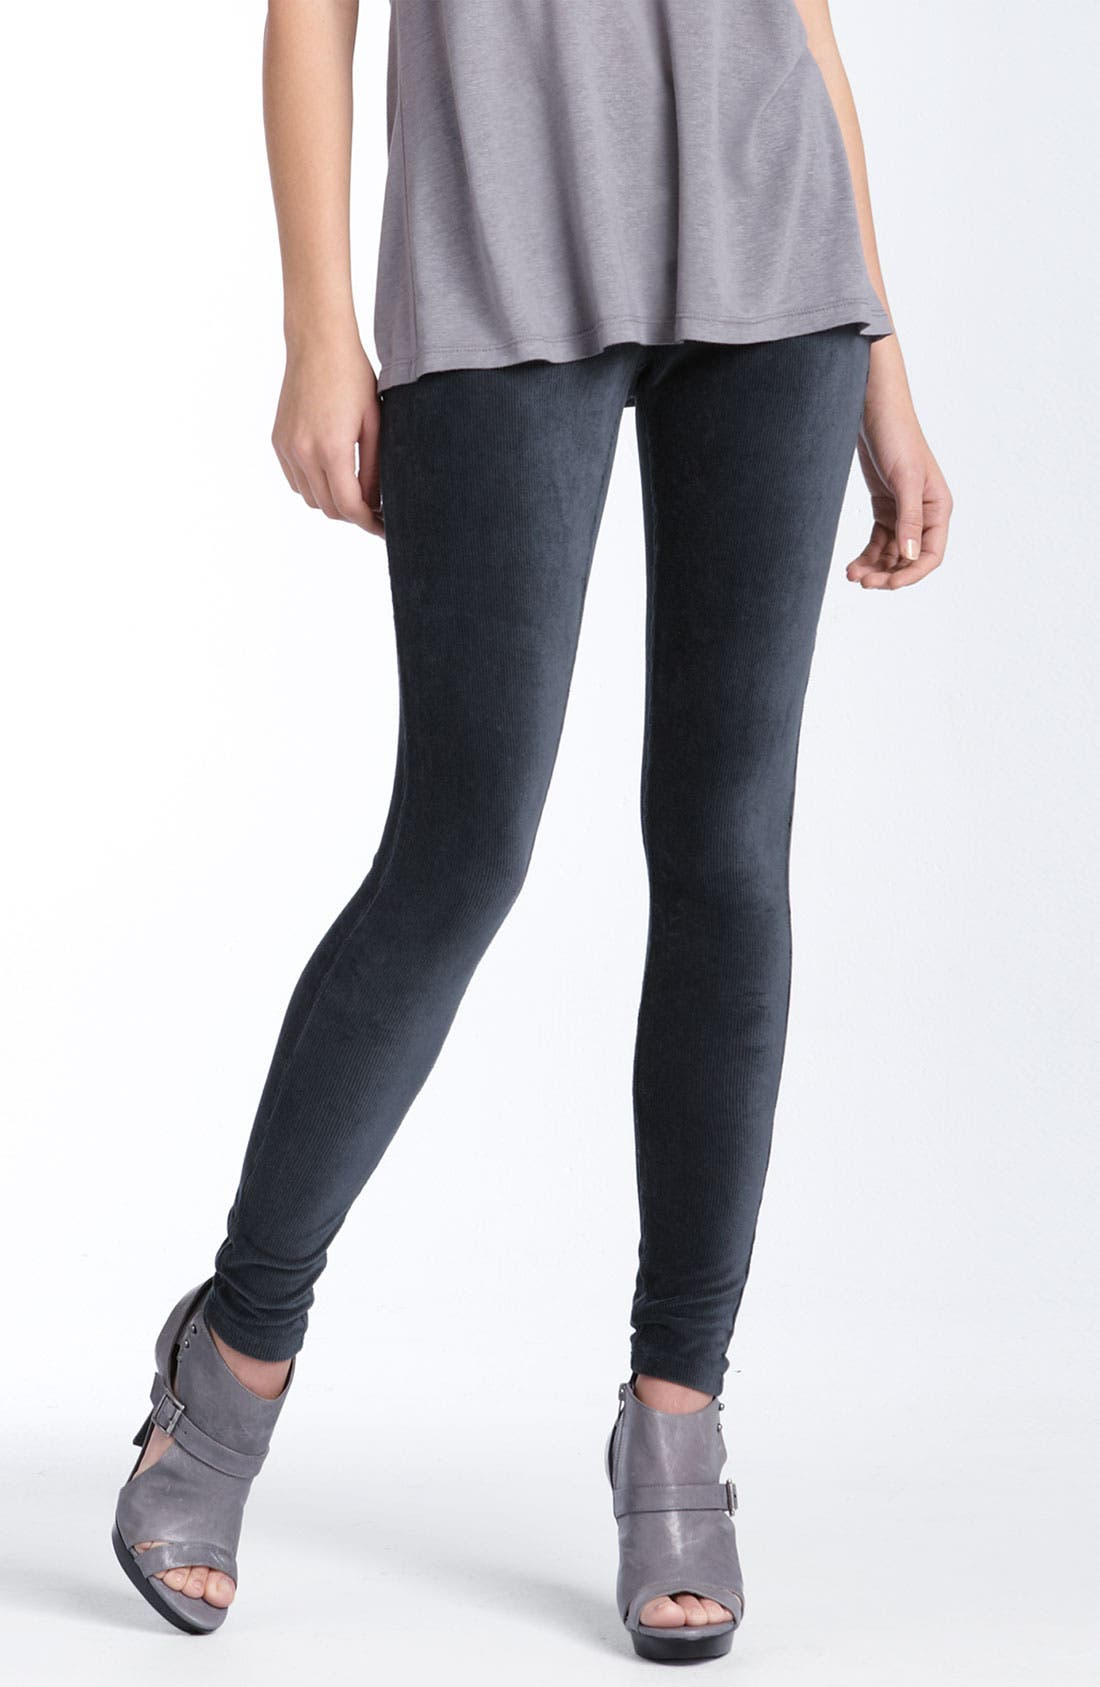 Alternate Image 1 Selected - Hue Corduroy Stretch Leggings